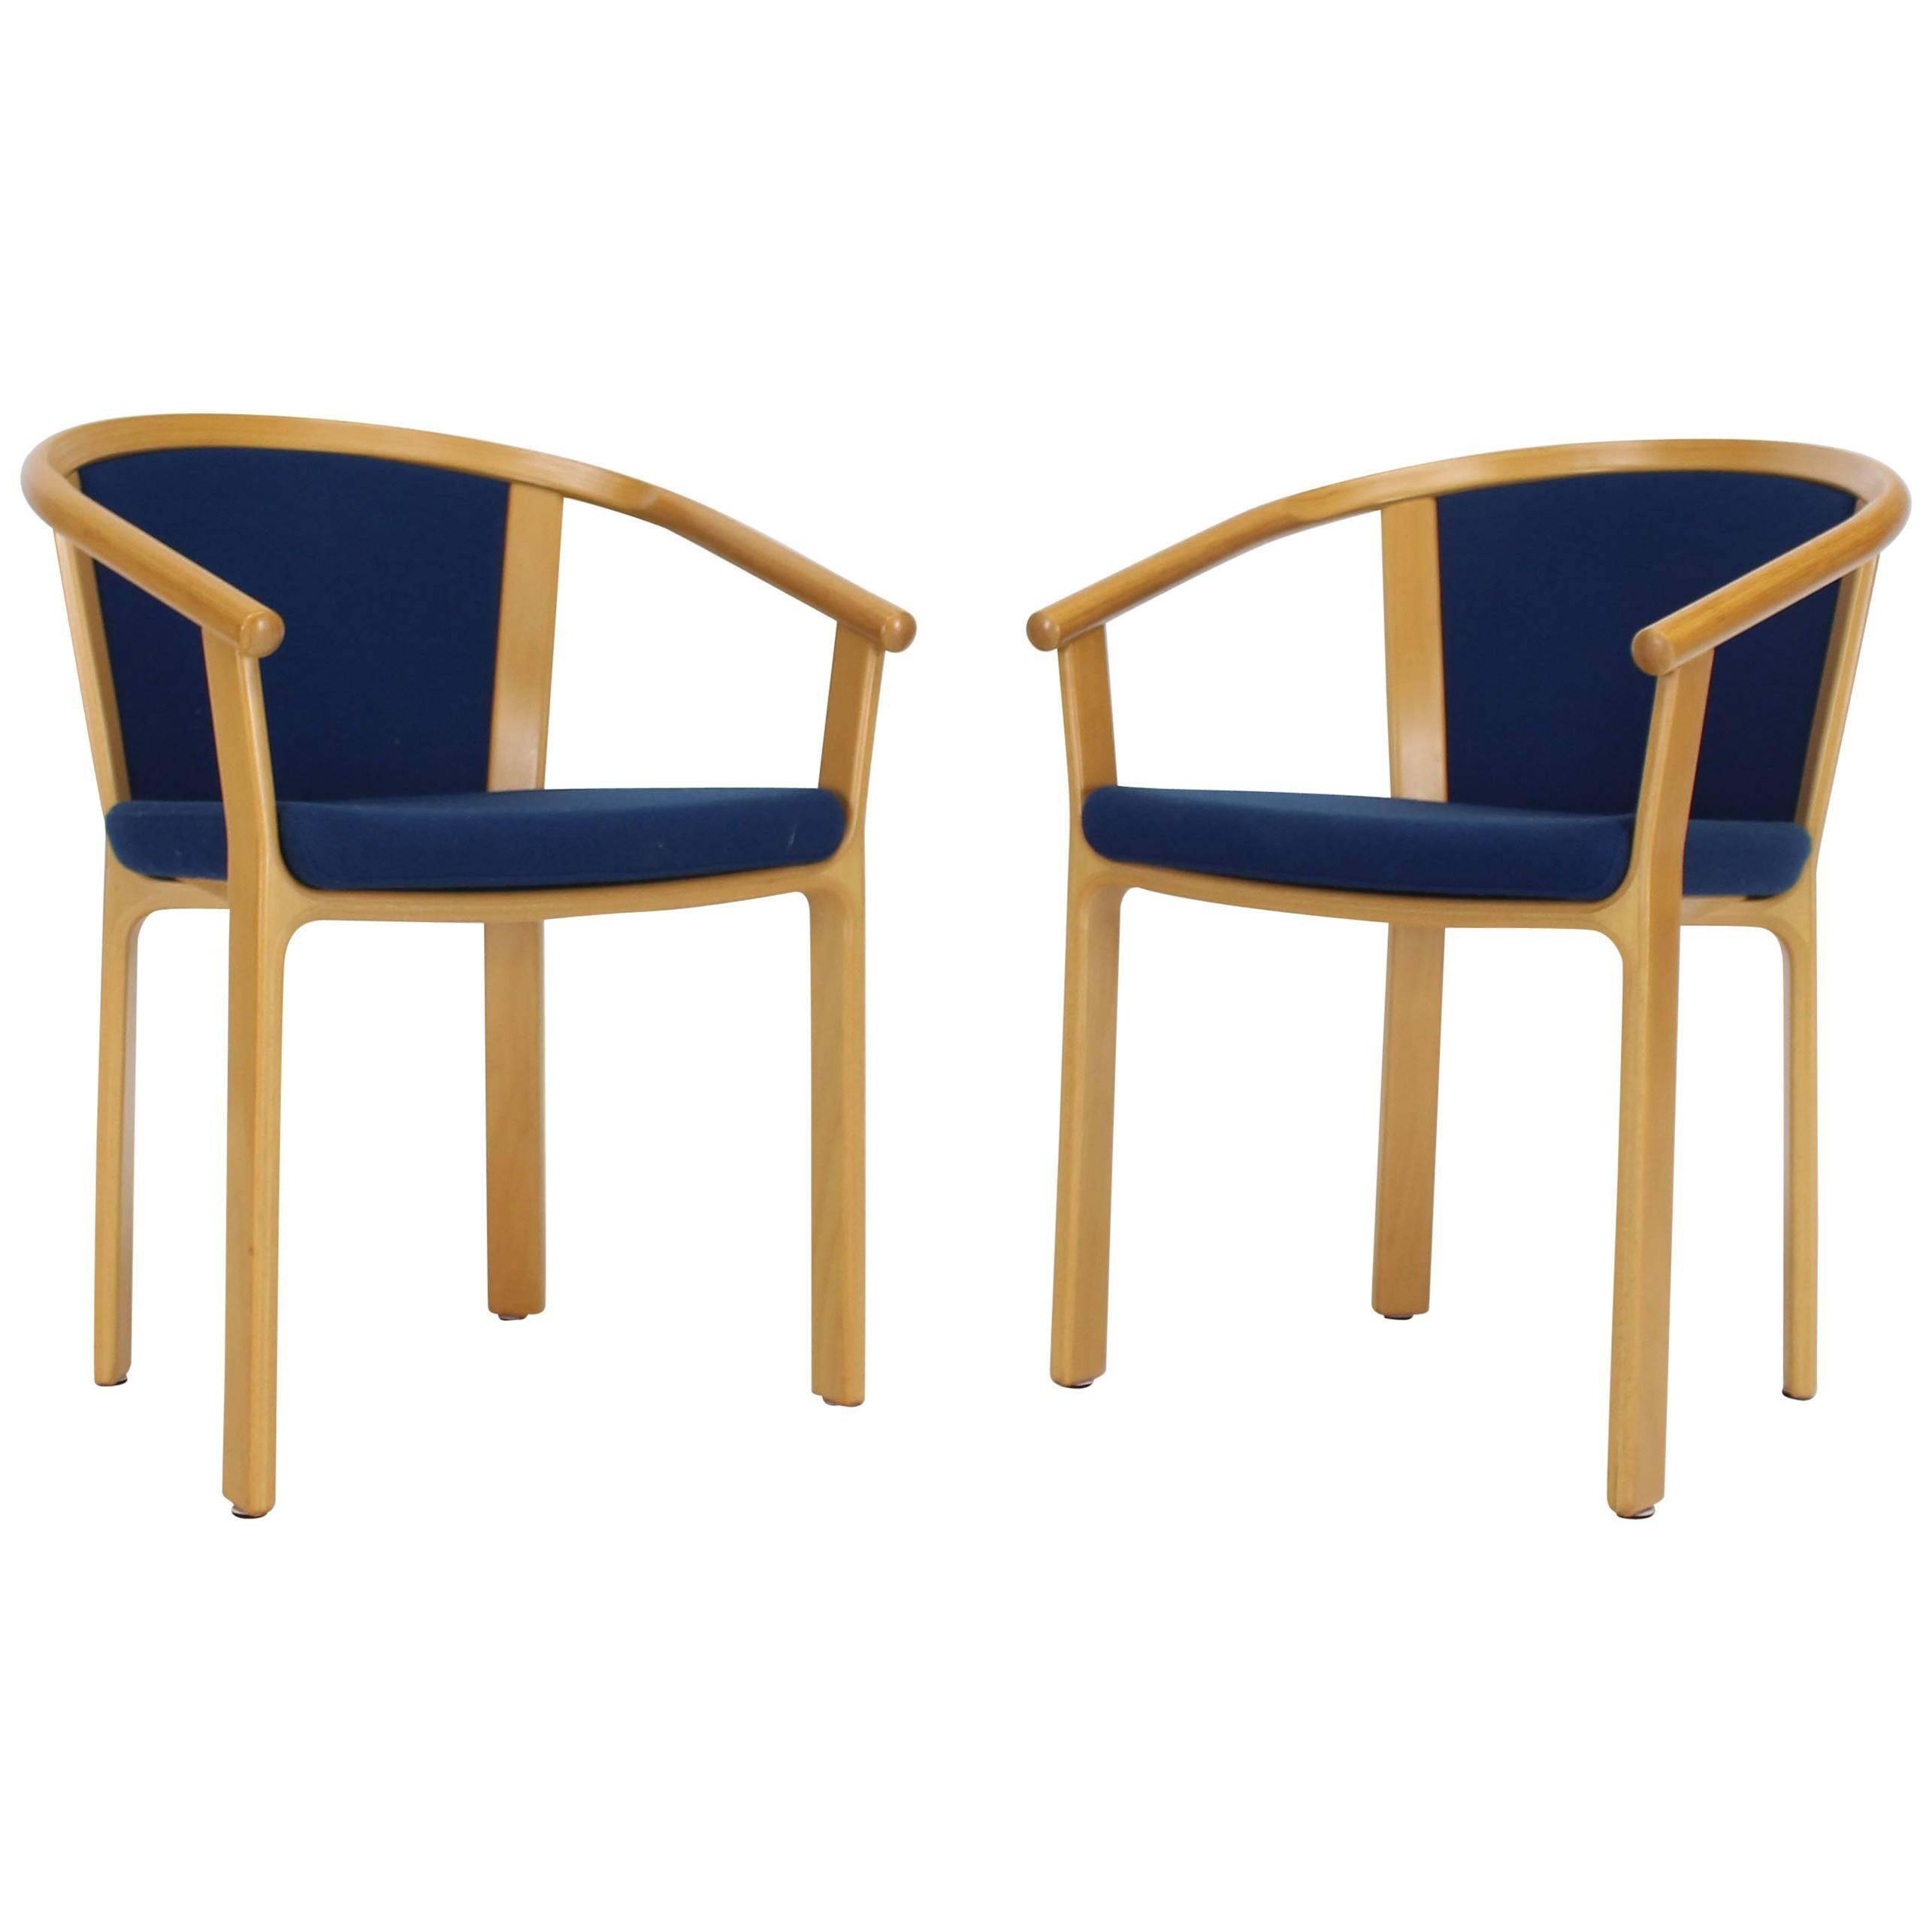 Pair Of Danish Modern Barrel Back Chairs